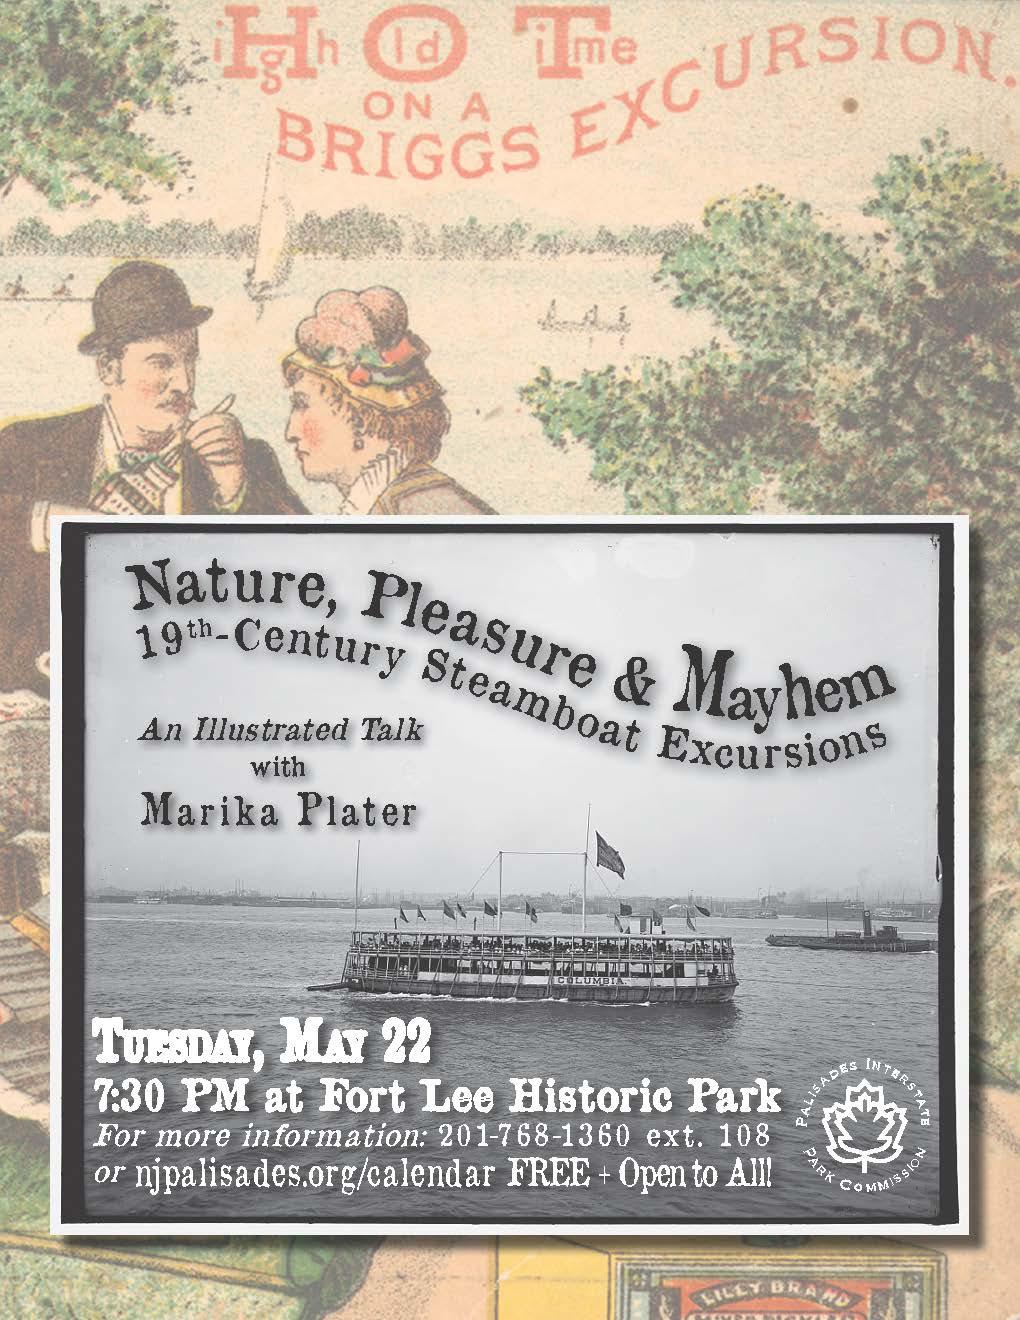 Nature, Pleasure & Mayhem: 19th-Century Steamboat Excursions